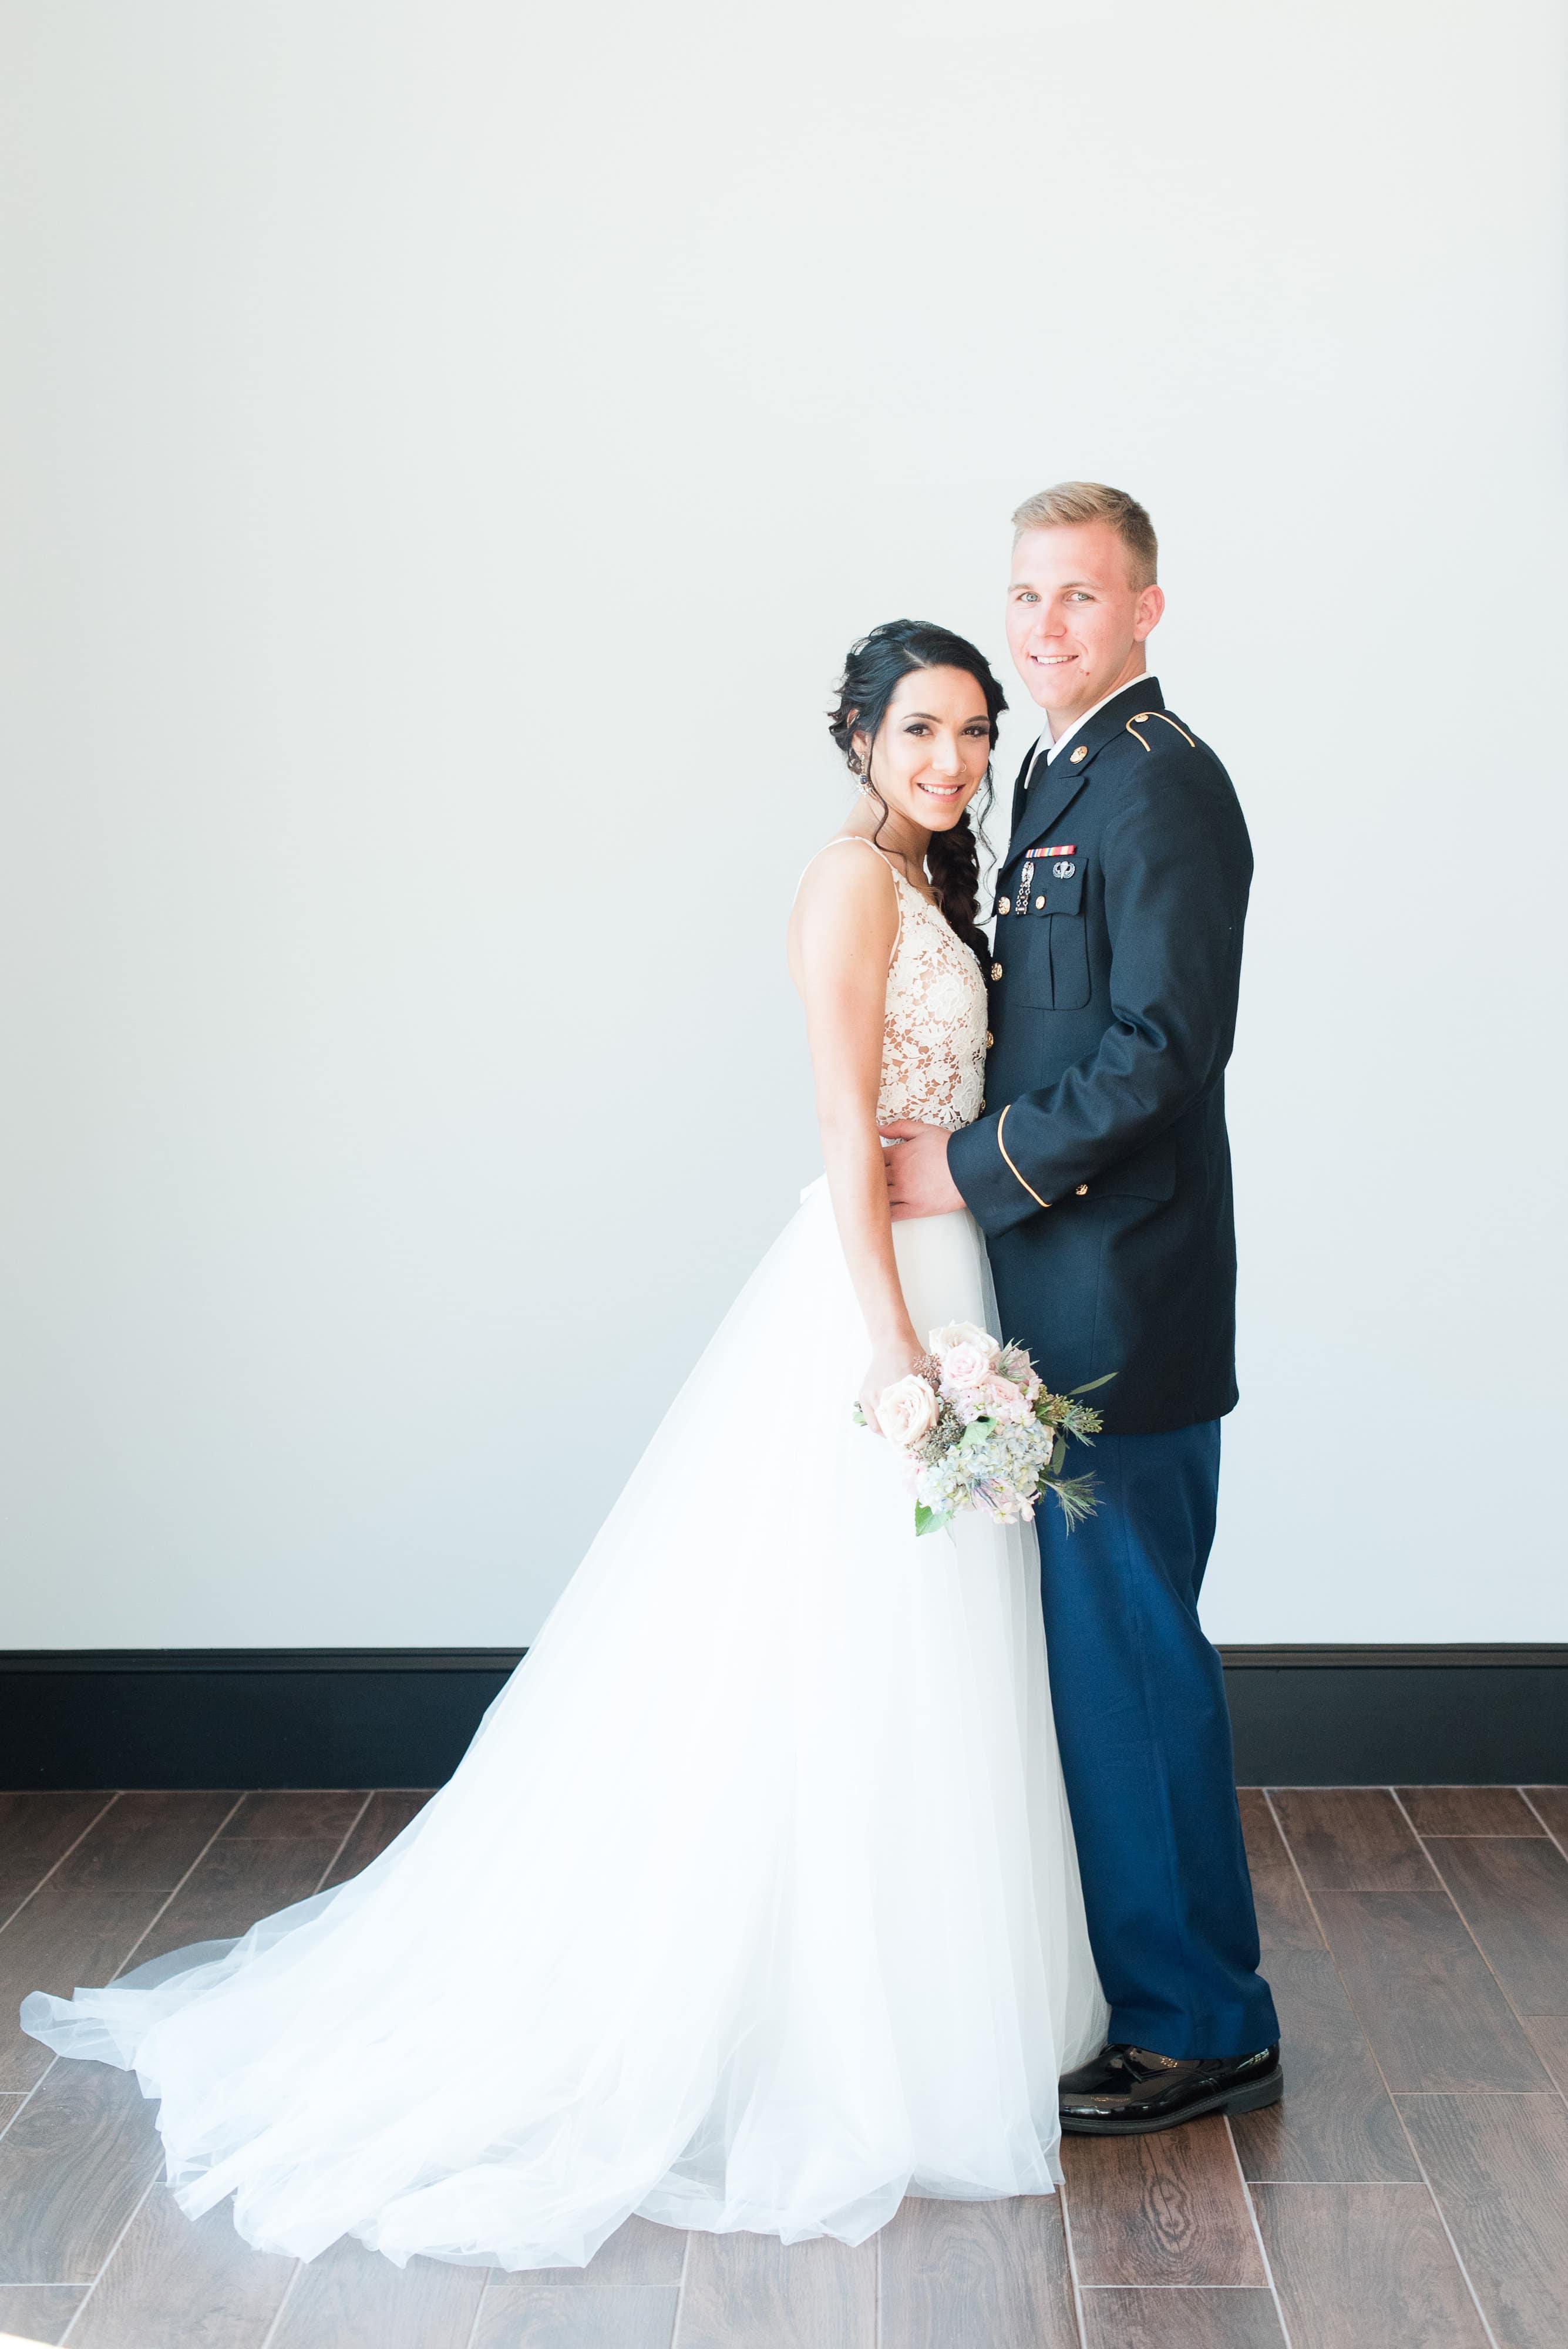 Bride with amazing make up by Jennifer Carver